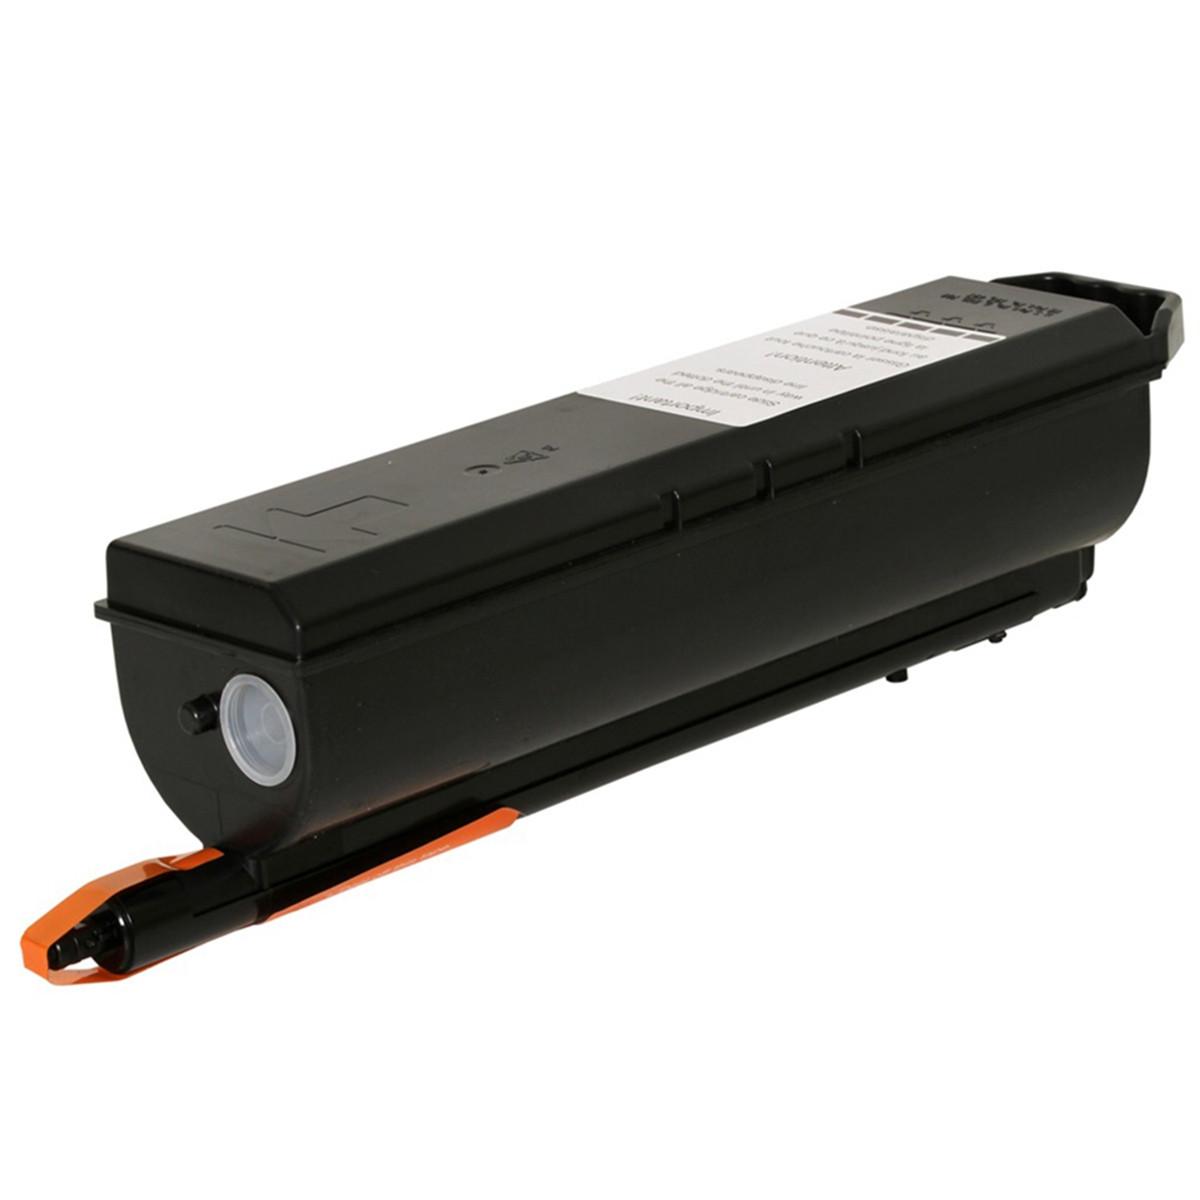 Toner Compatível com Canon GPR-1 1390A003AA | IMAGERUNNER 550 60 600 7200 | Katun Performance 1700g